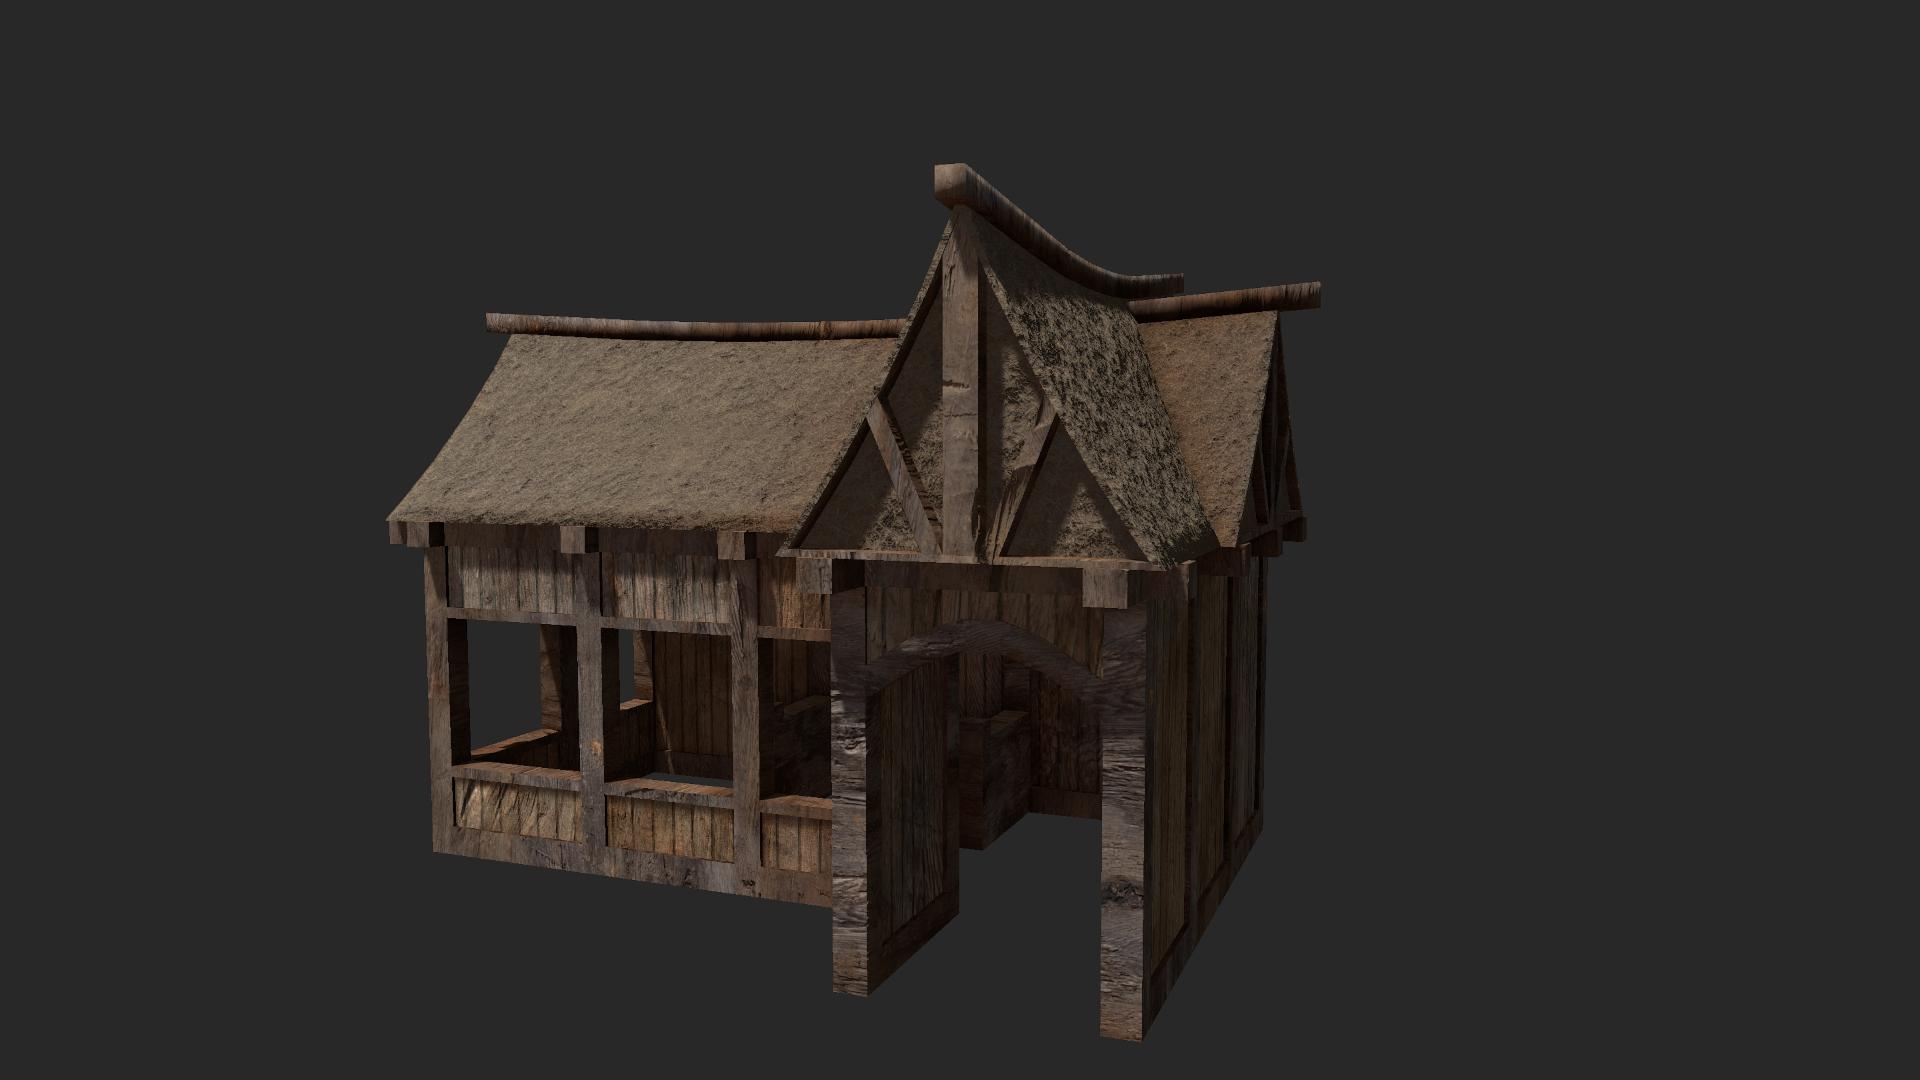 3d medieval stable에 대한 이미지 검색결과   3d 모델링   Pinterest ... for Medieval Stable  565ane